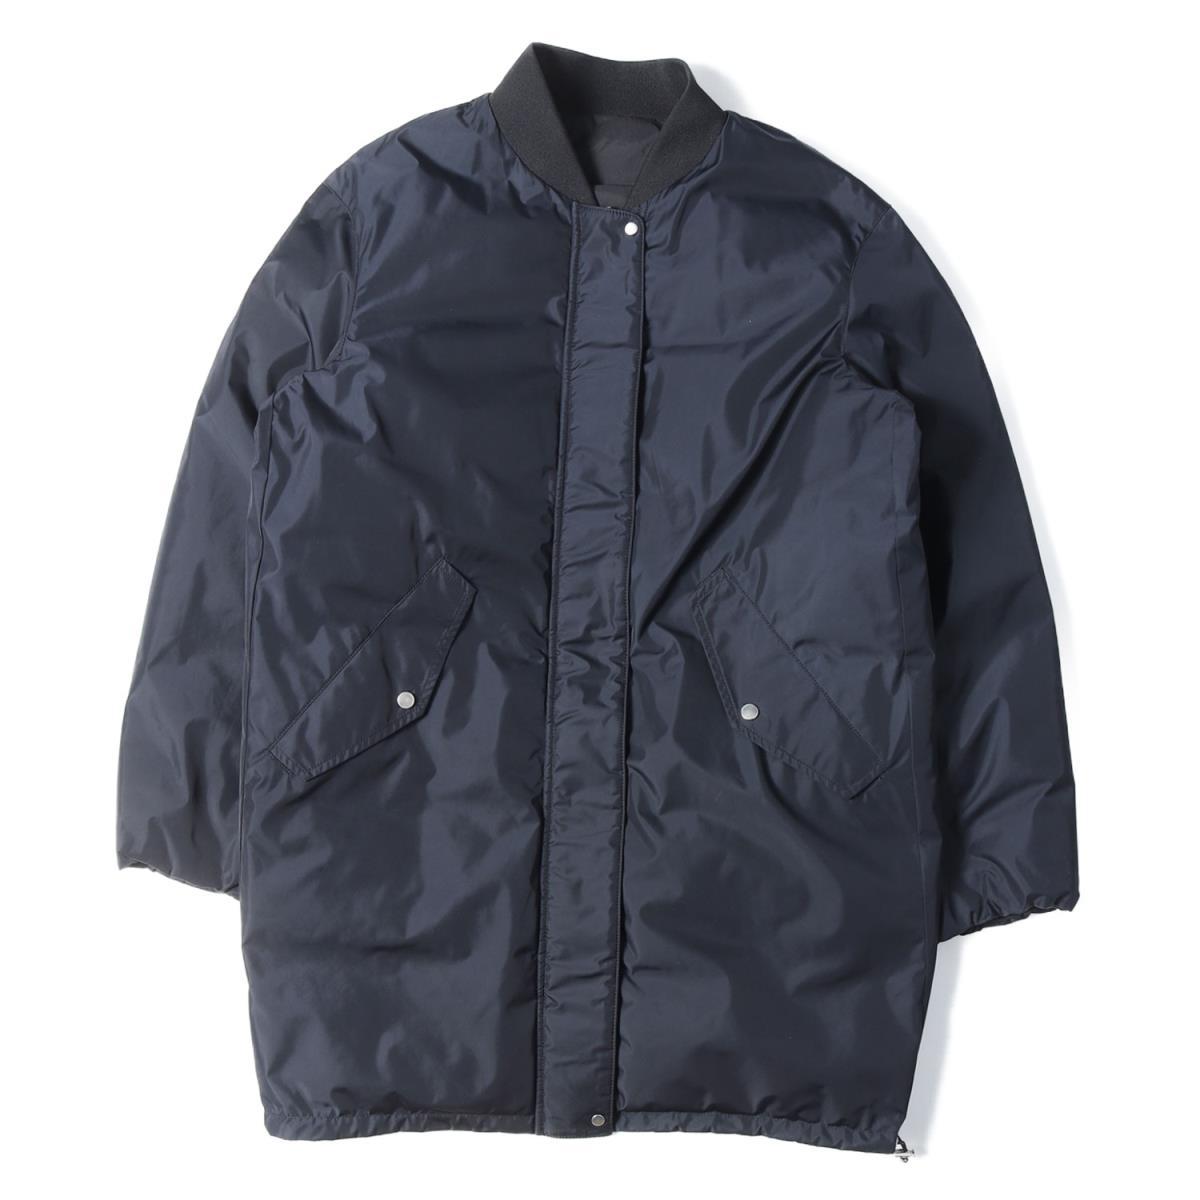 MACPHEE マカフィー 中綿 ポリエステル リバーシブル コート ブラック 36(9号) 【レディース】【中古】【K2502】